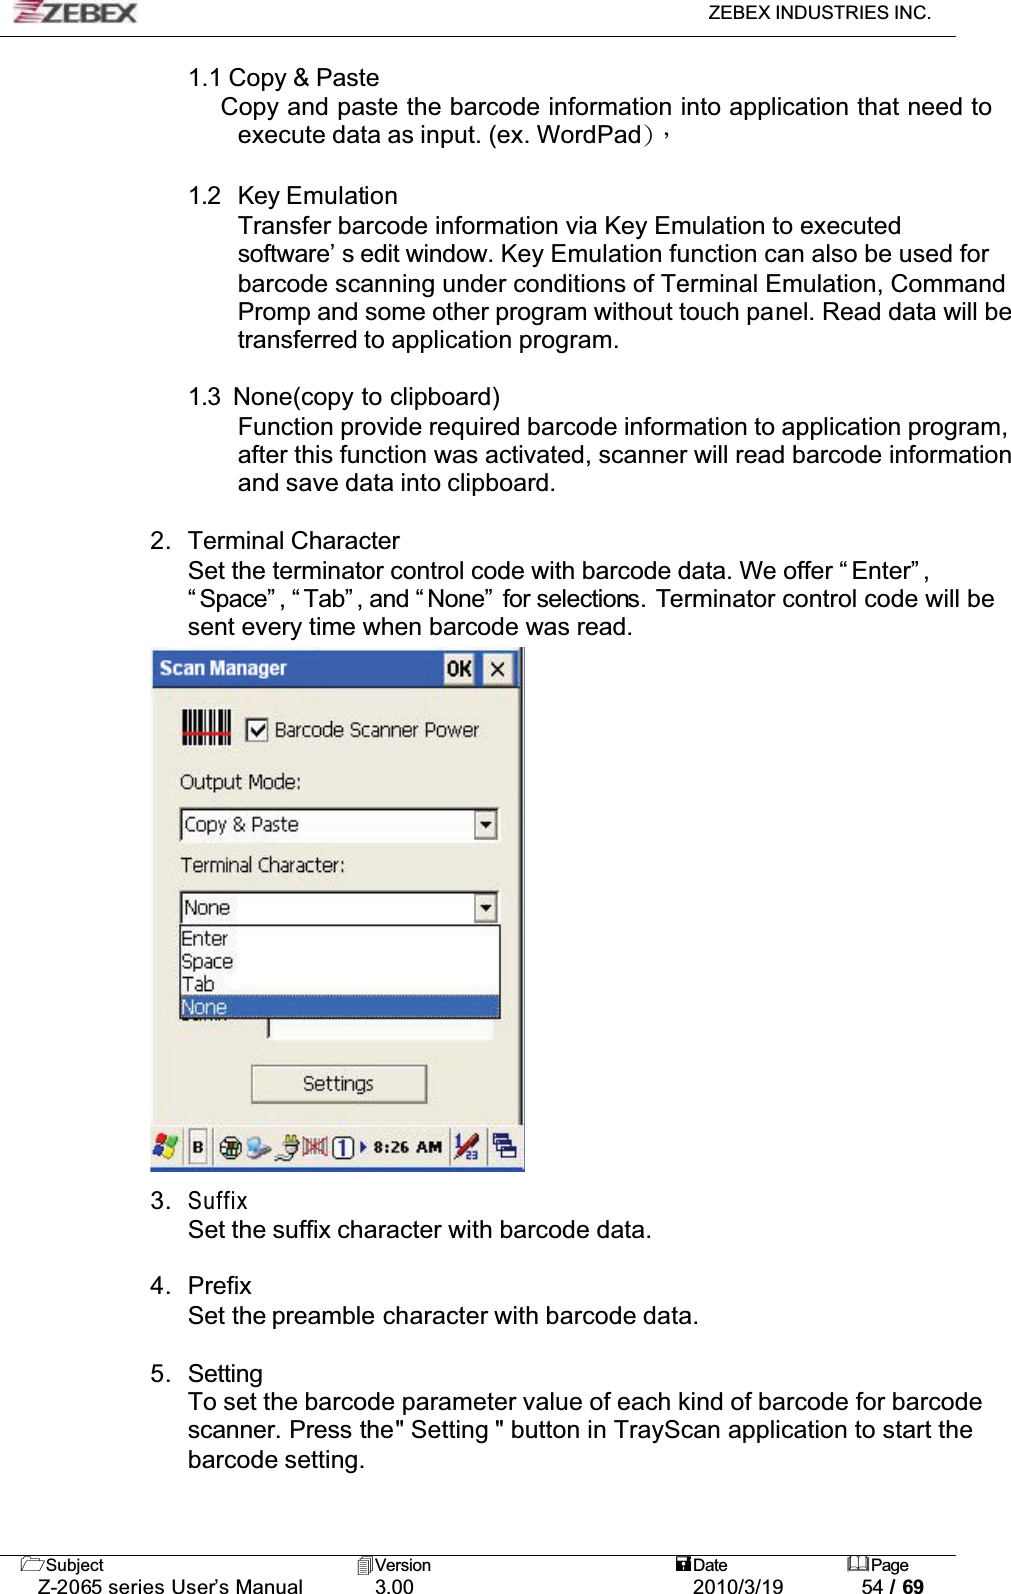 Zebex Z-2065S Windows CE NET Handheld Computer User Manual Z